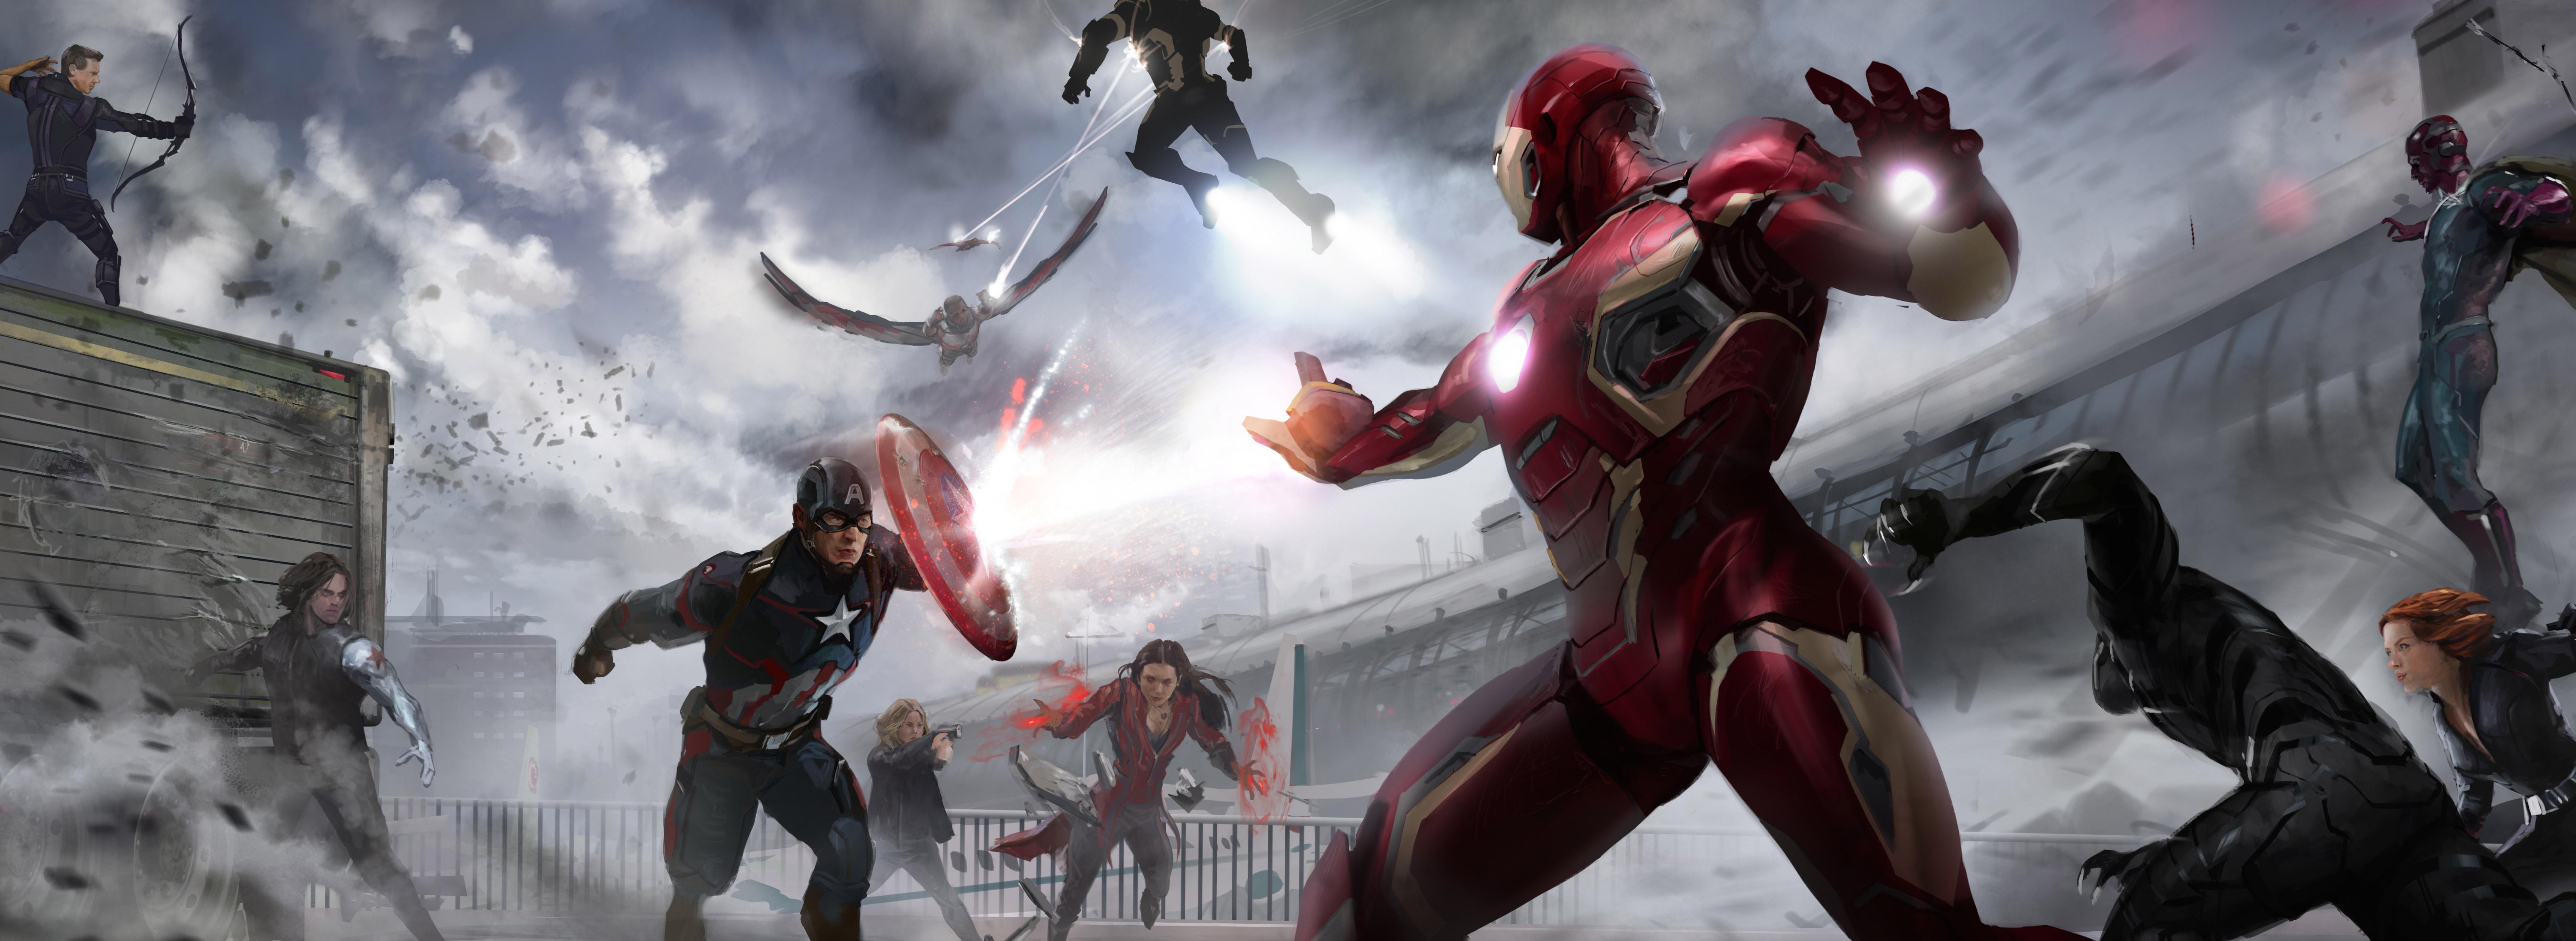 Marvel Civil War Artwork